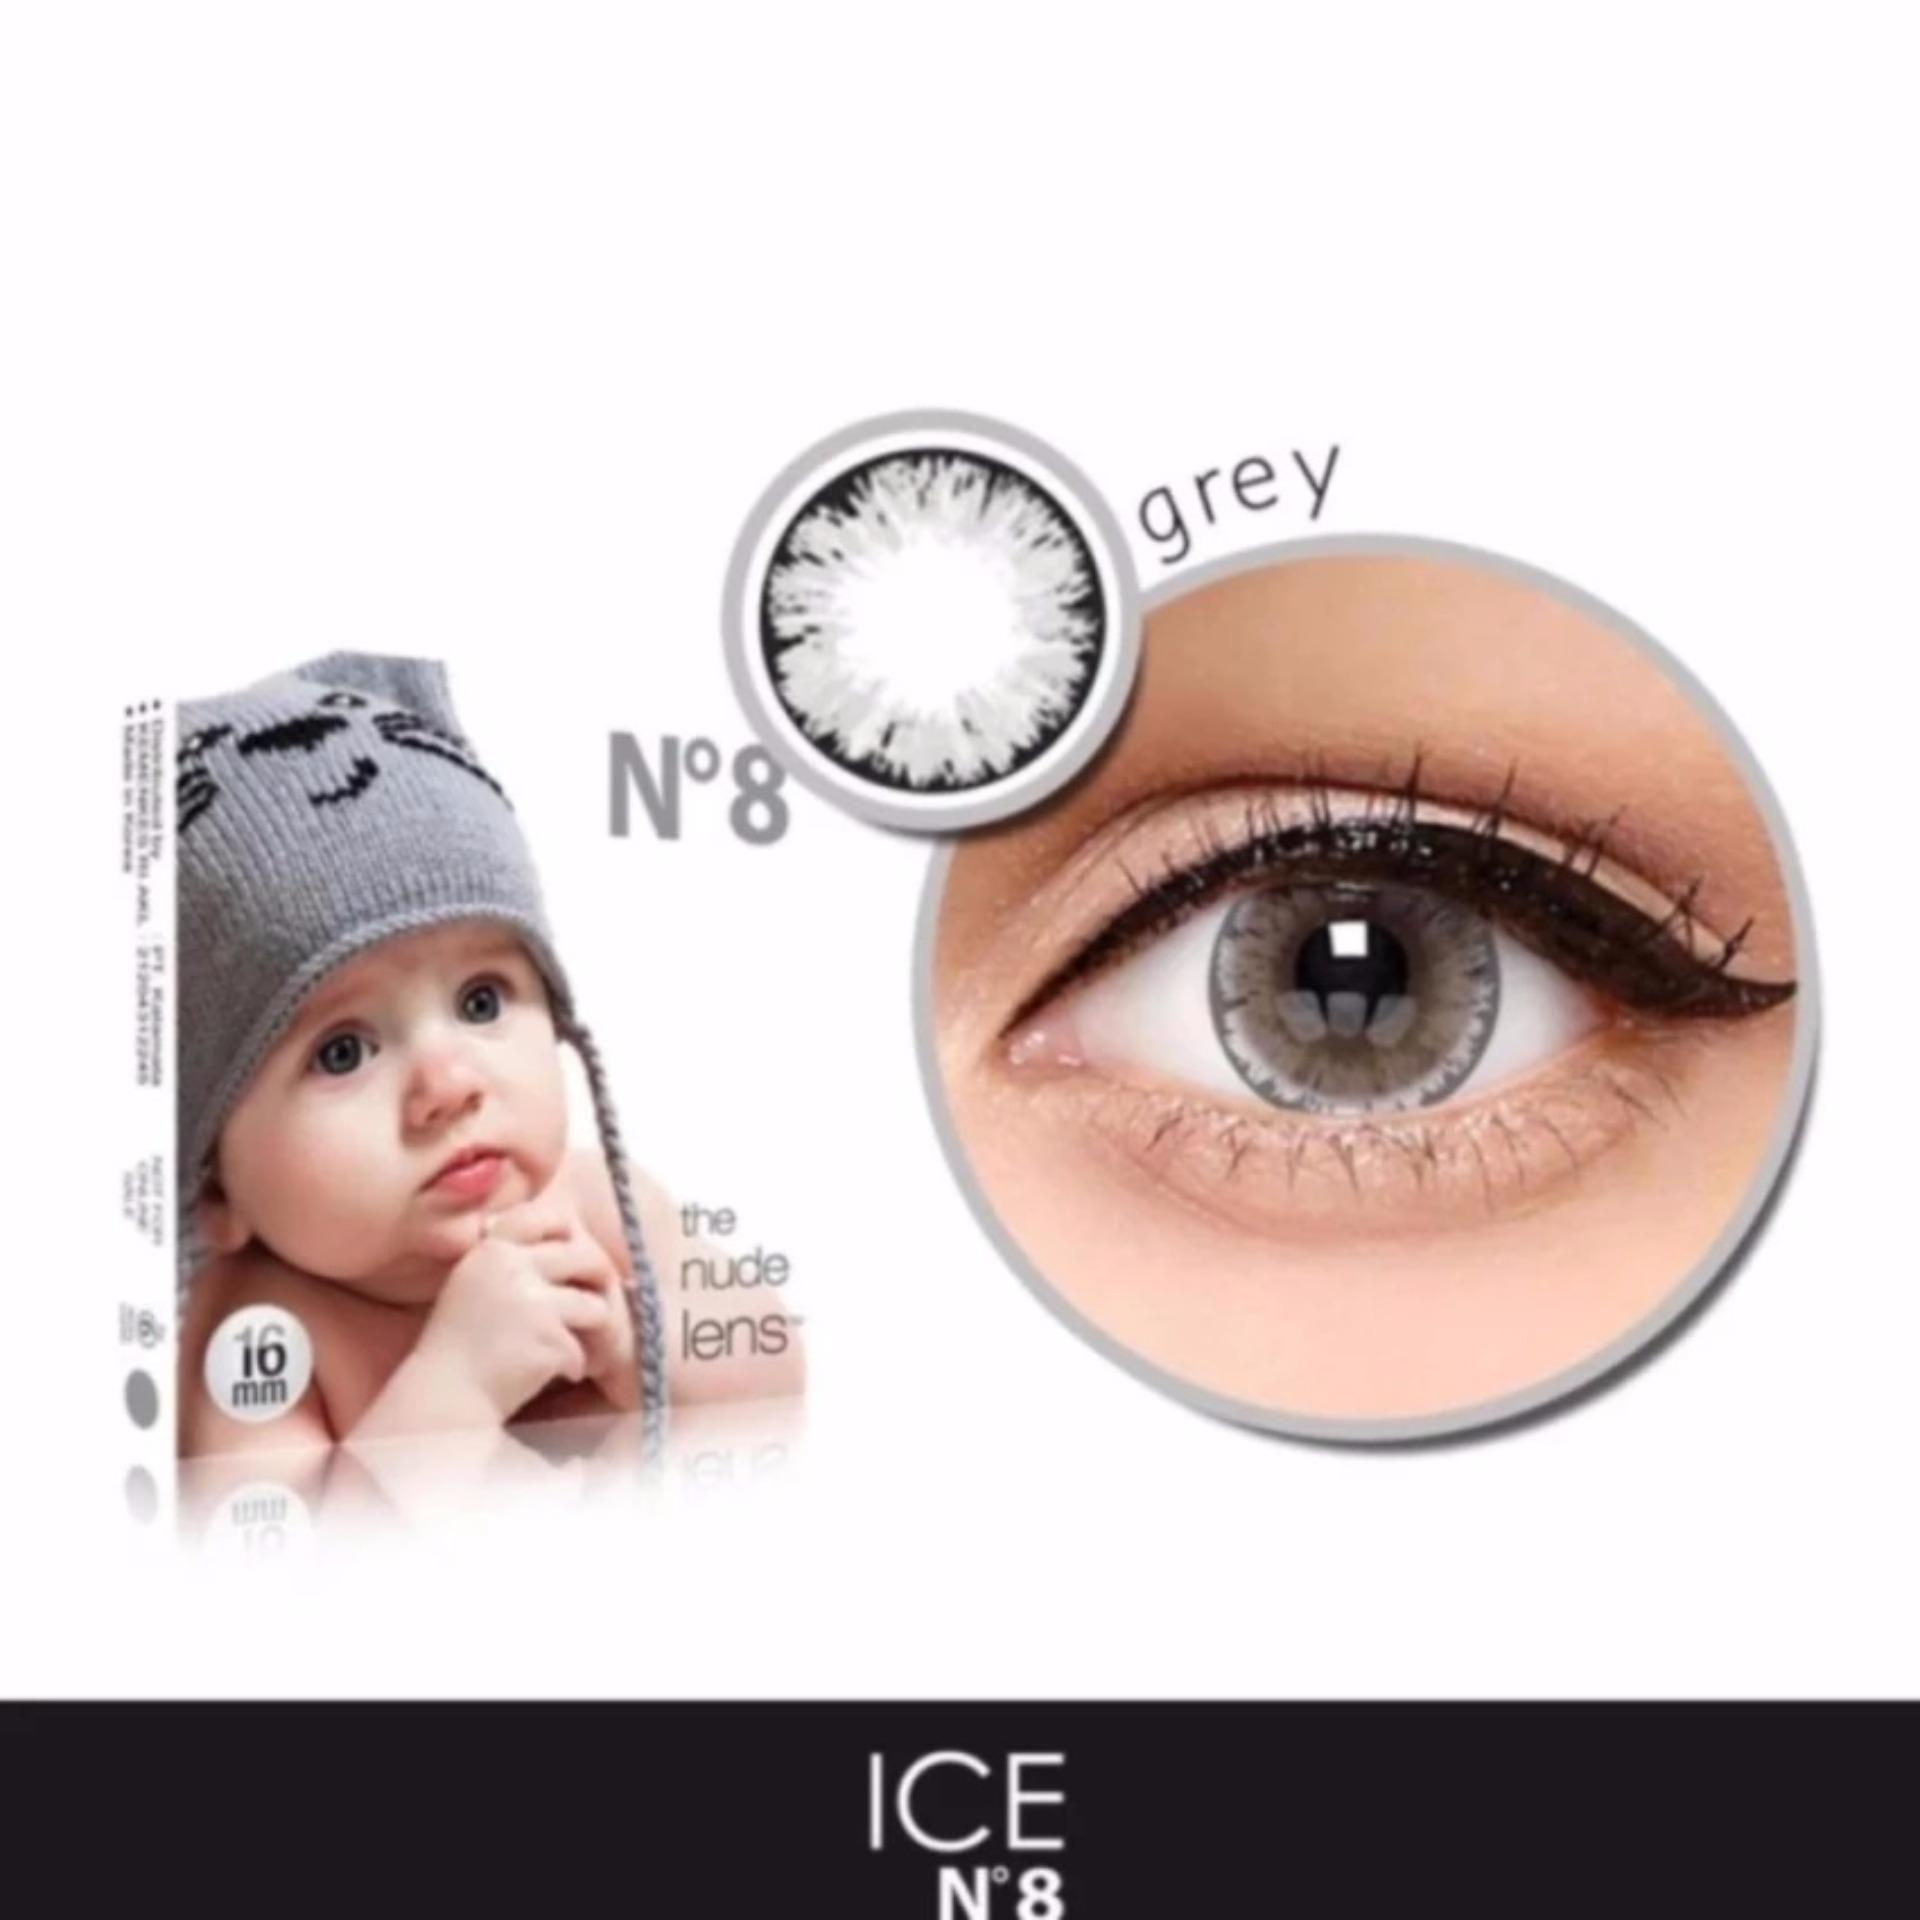 X2 Ice Nude N8 Softlens - Grey + Free Lenscase .